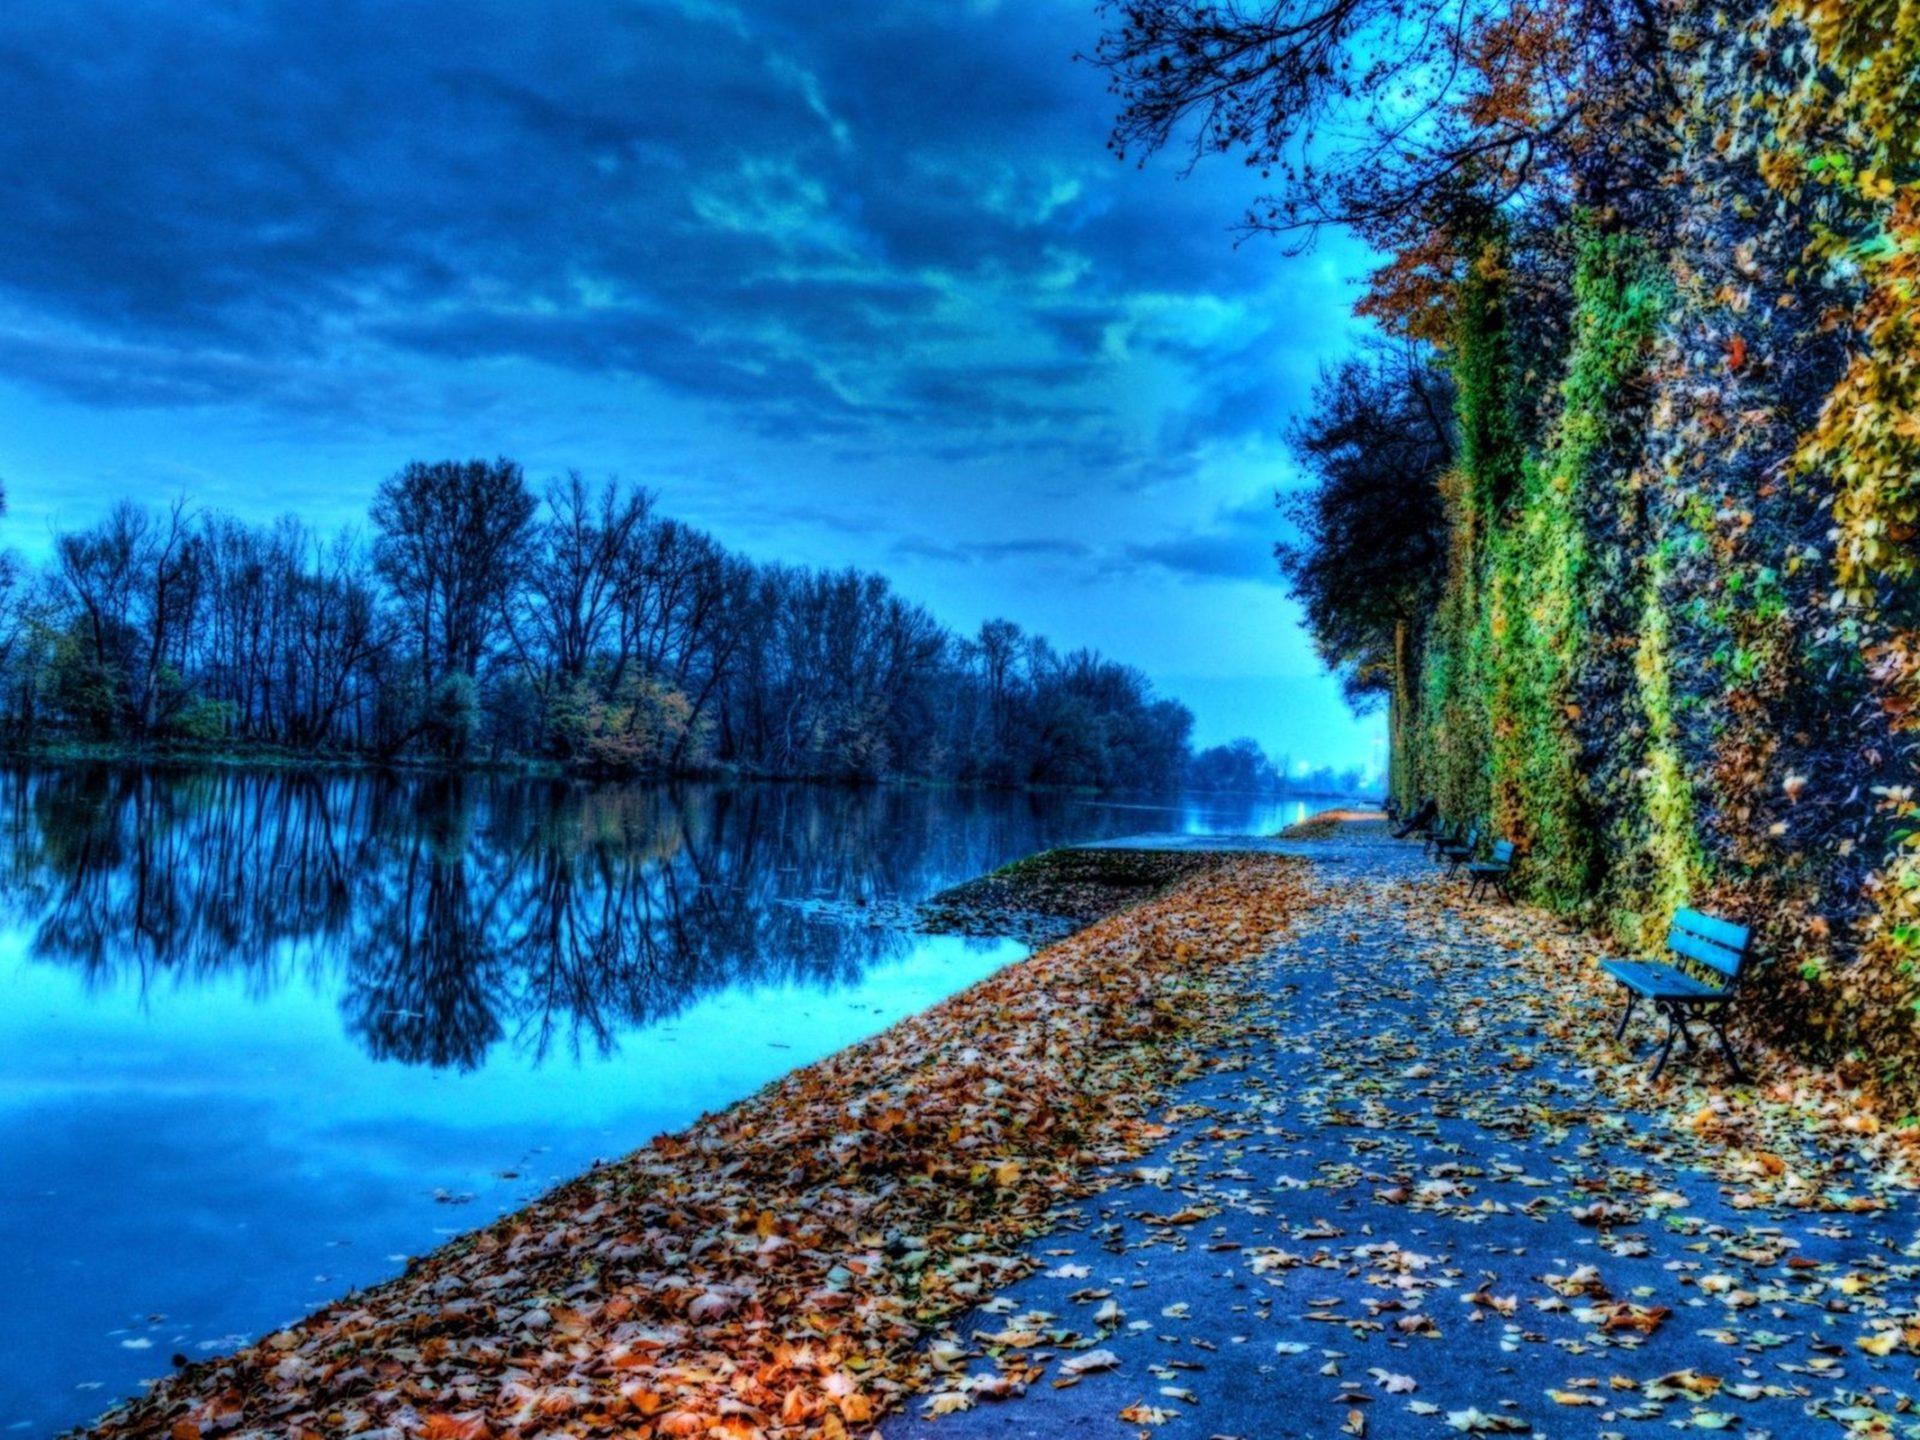 Fall Foliage Wallpaper Screensavers Riverside Bench During Autumn Nature Hd Wallpaper